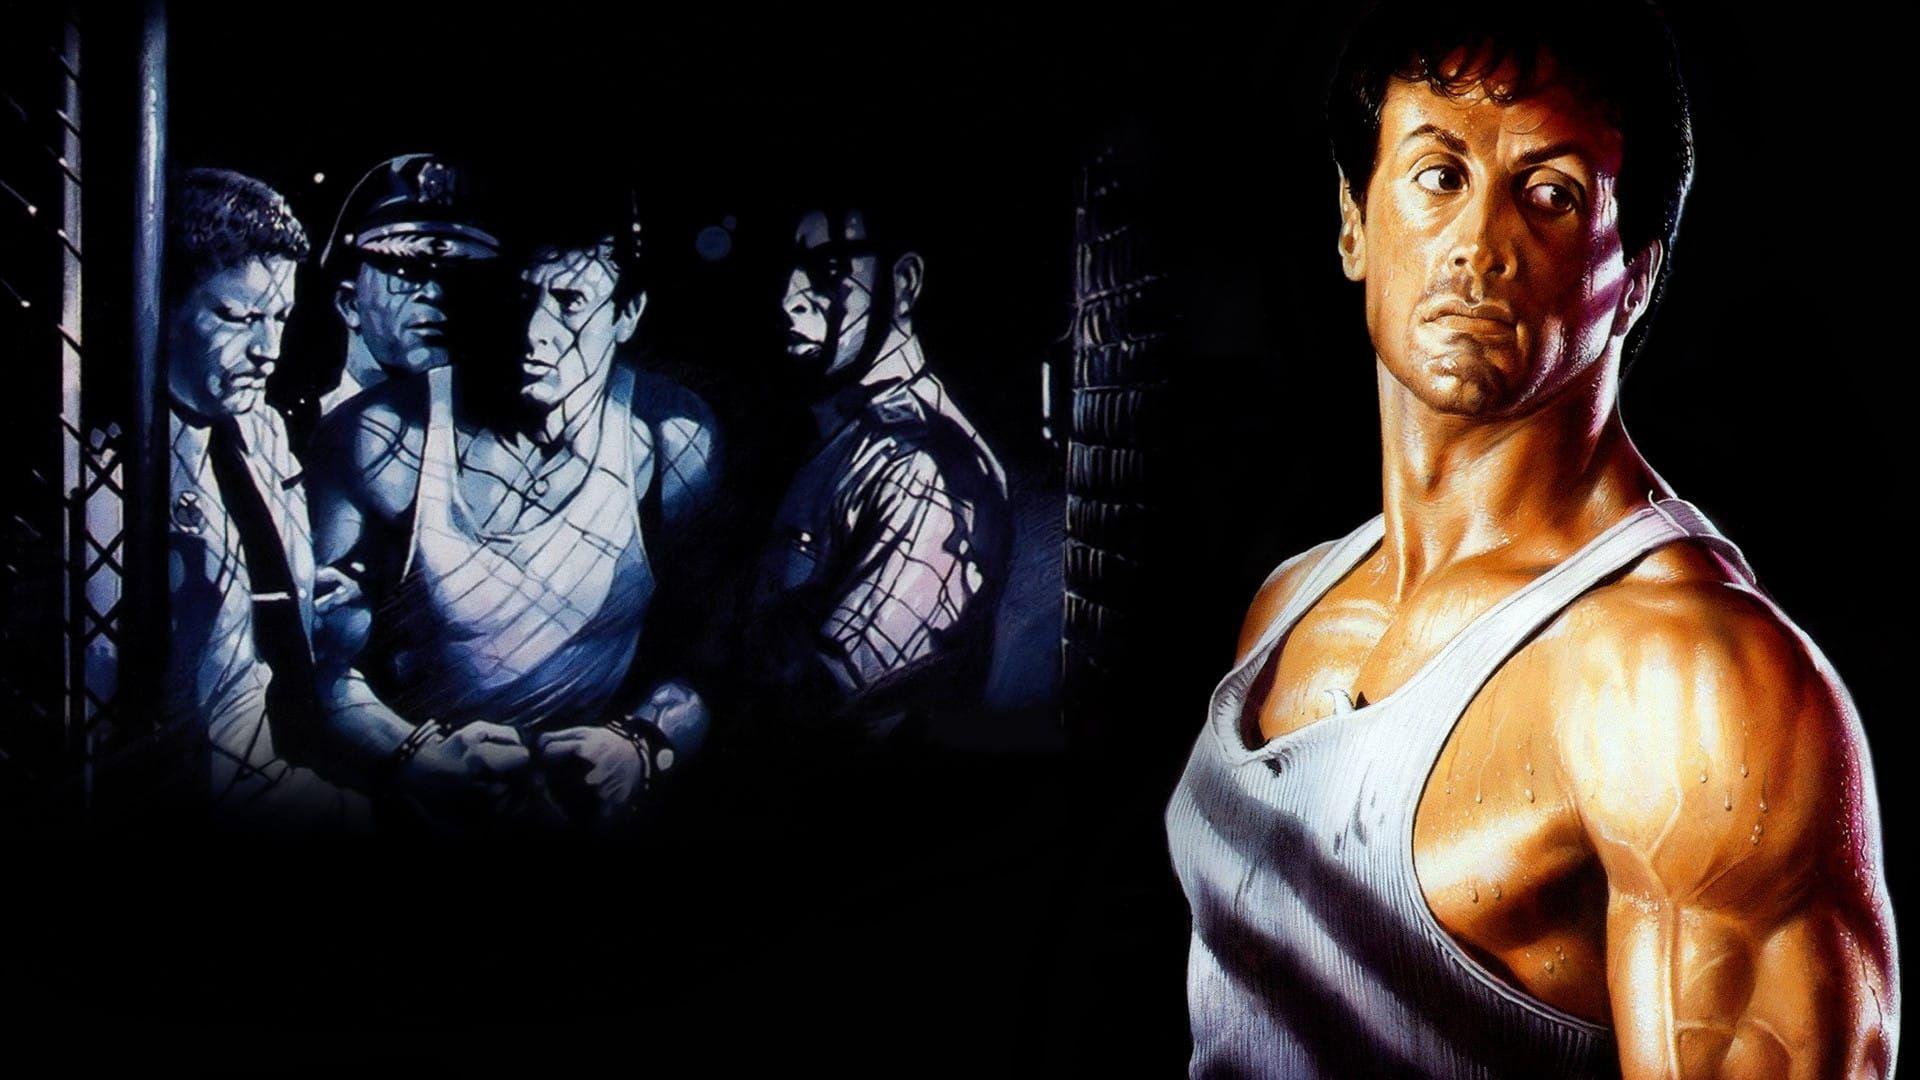 Rocky 1976 Online Teljes Film Filmek Magyarul Letoltes Hd Rocky Balboa Philadelphia Kulvarosaban Az Olasz Szegeny Rocky Balboa Apollo Creed Sylvester Stallone